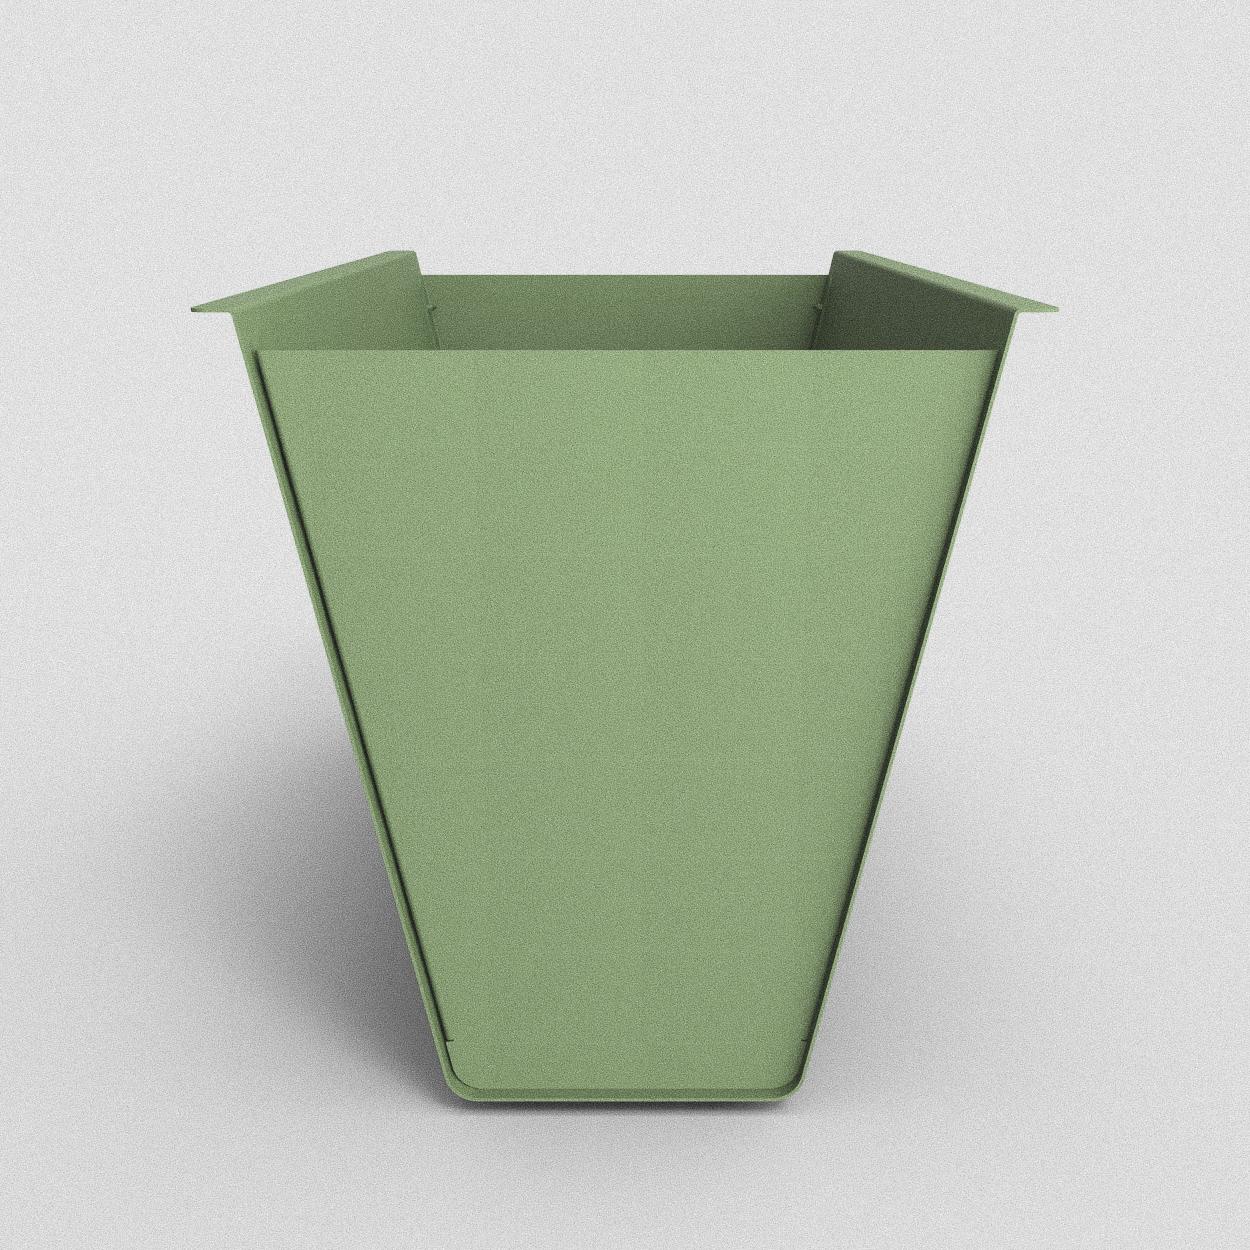 600L / Standardfärg: Mossa